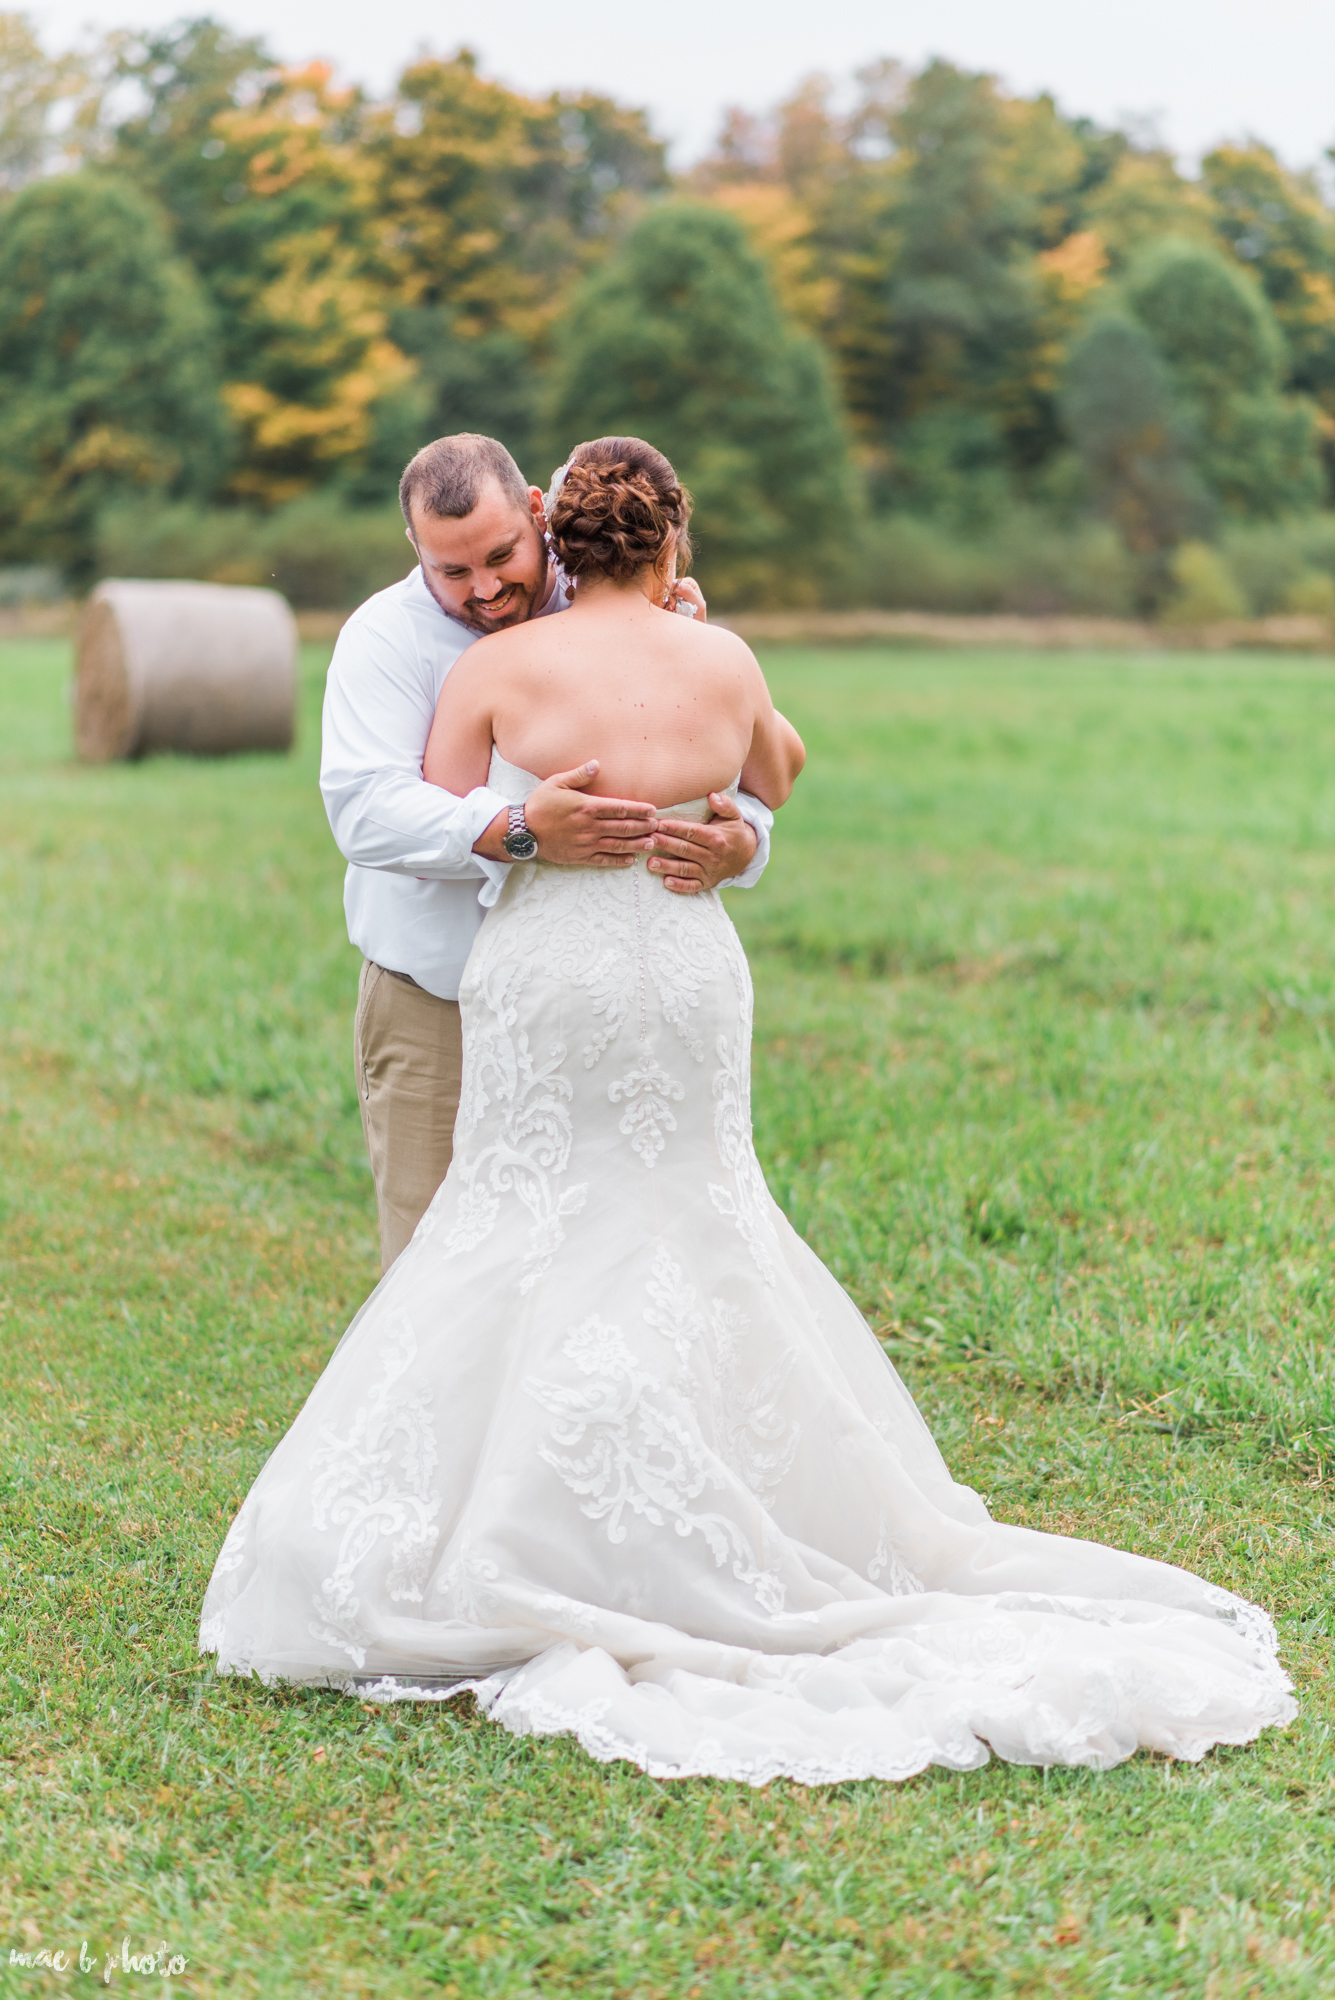 Sarah & Dustin's Rustic Chic Barn Wedding at Hartford Hill Winery in Hartford, Ohio by Mae B Photo-65.jpg